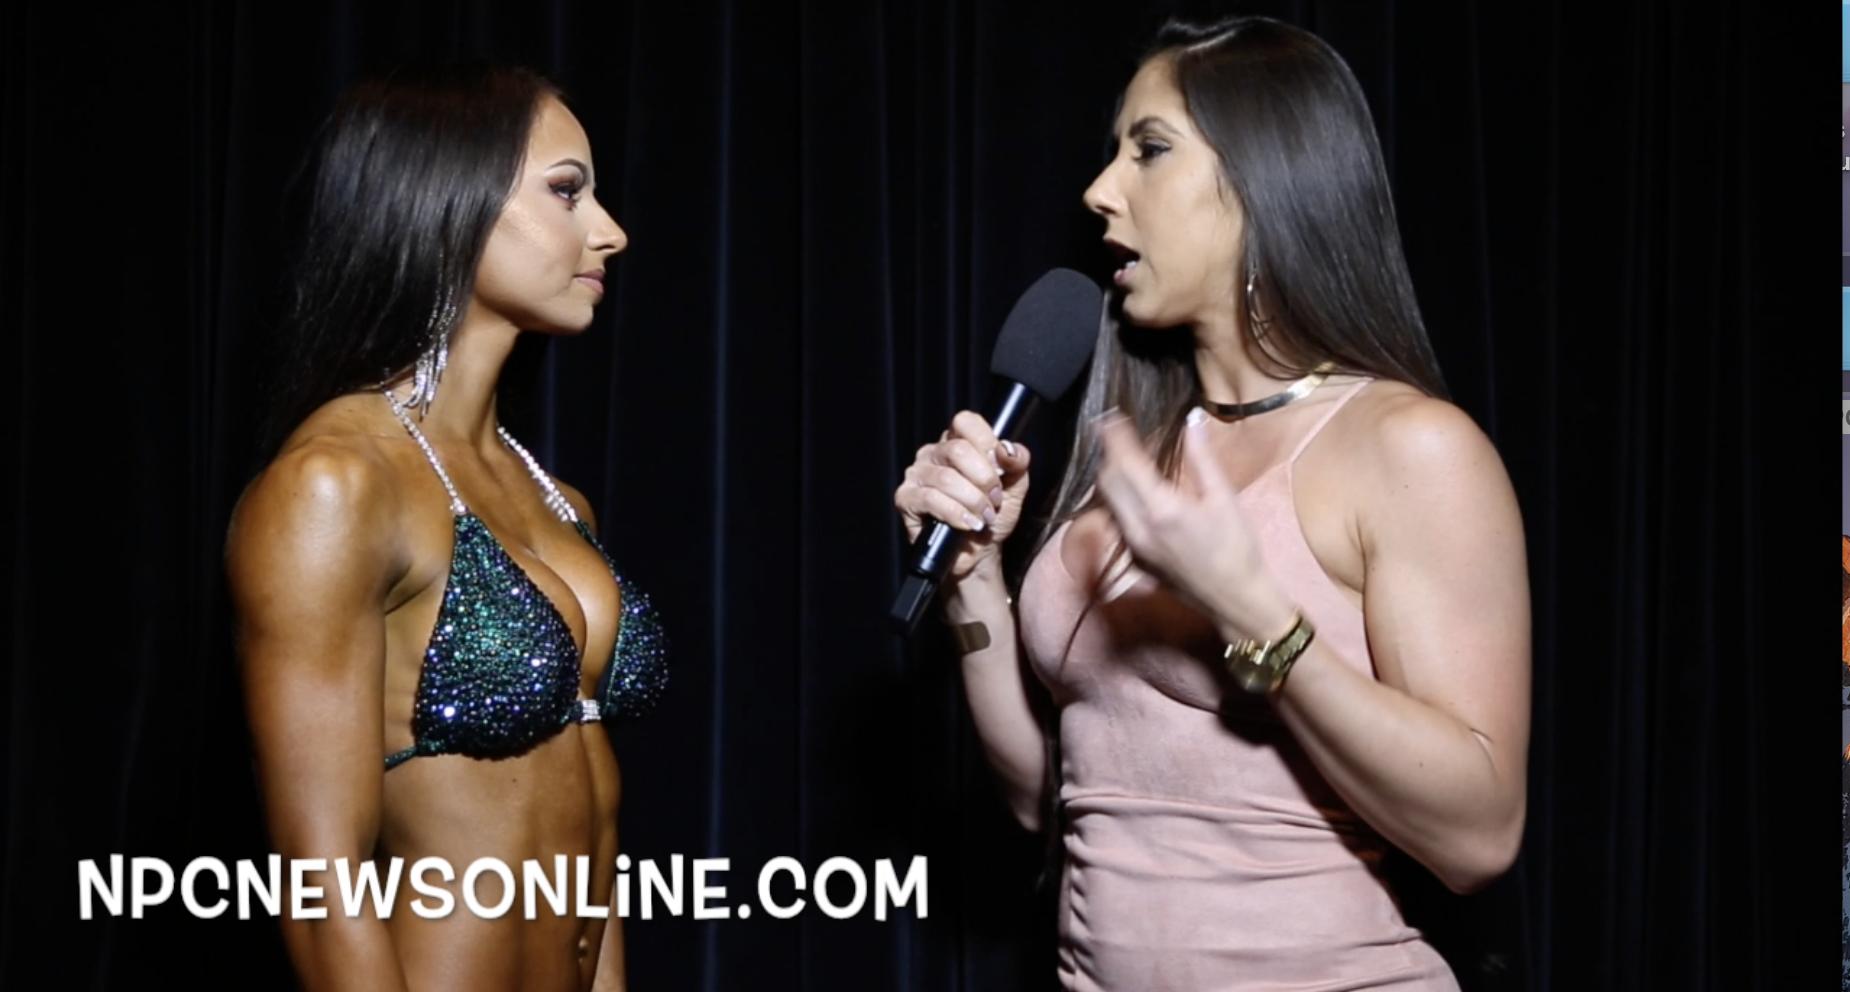 2017 NPC USA Bikini Overall Winner Danielle Phelps Interviewed By IFBB Bikini Pro Angelica Teixeira